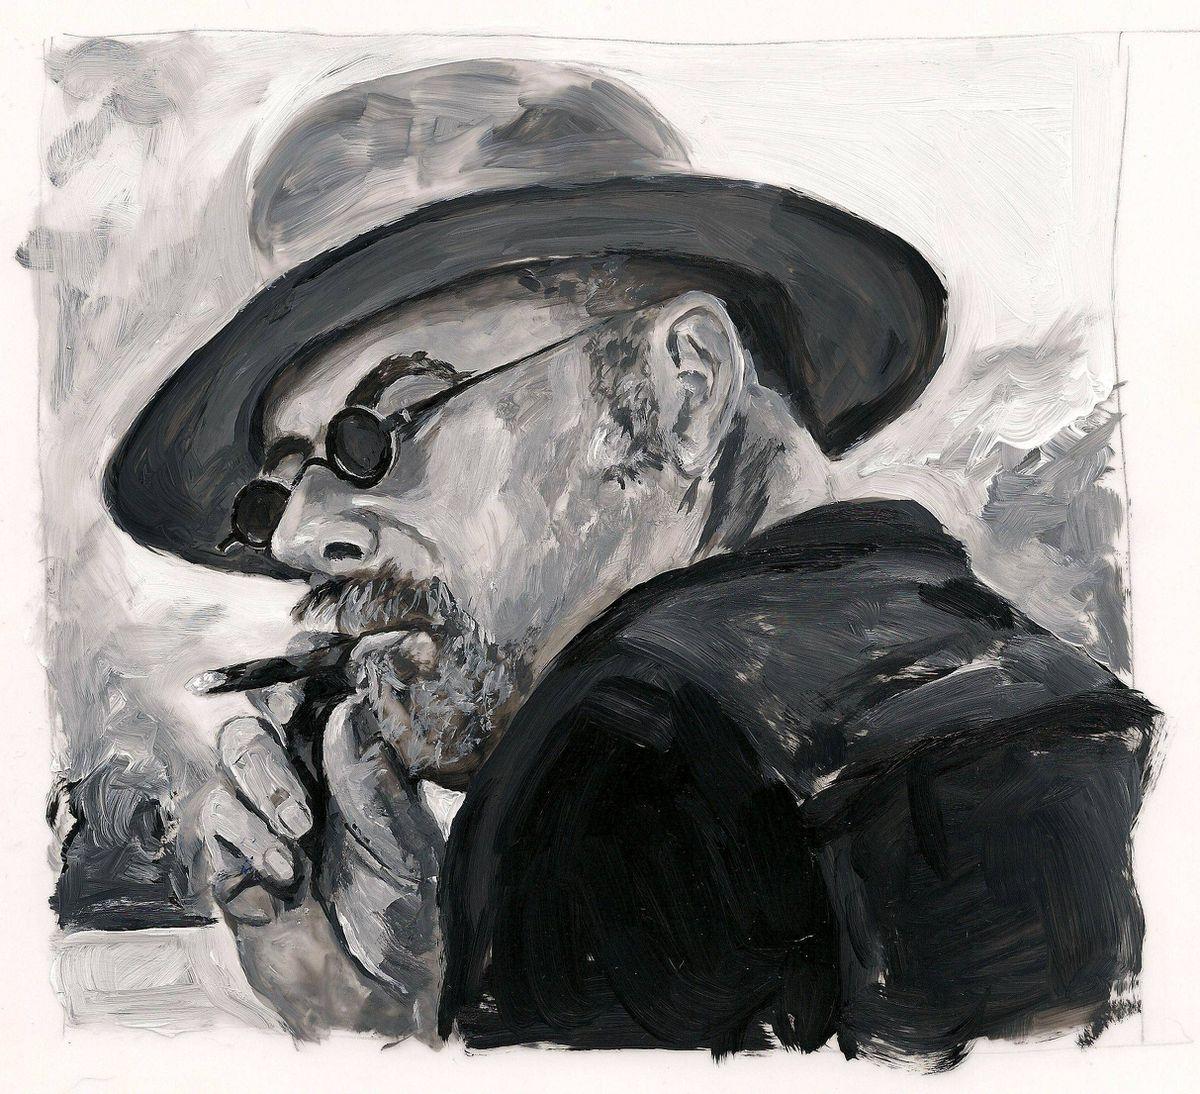 Lawrence Kurnarsky